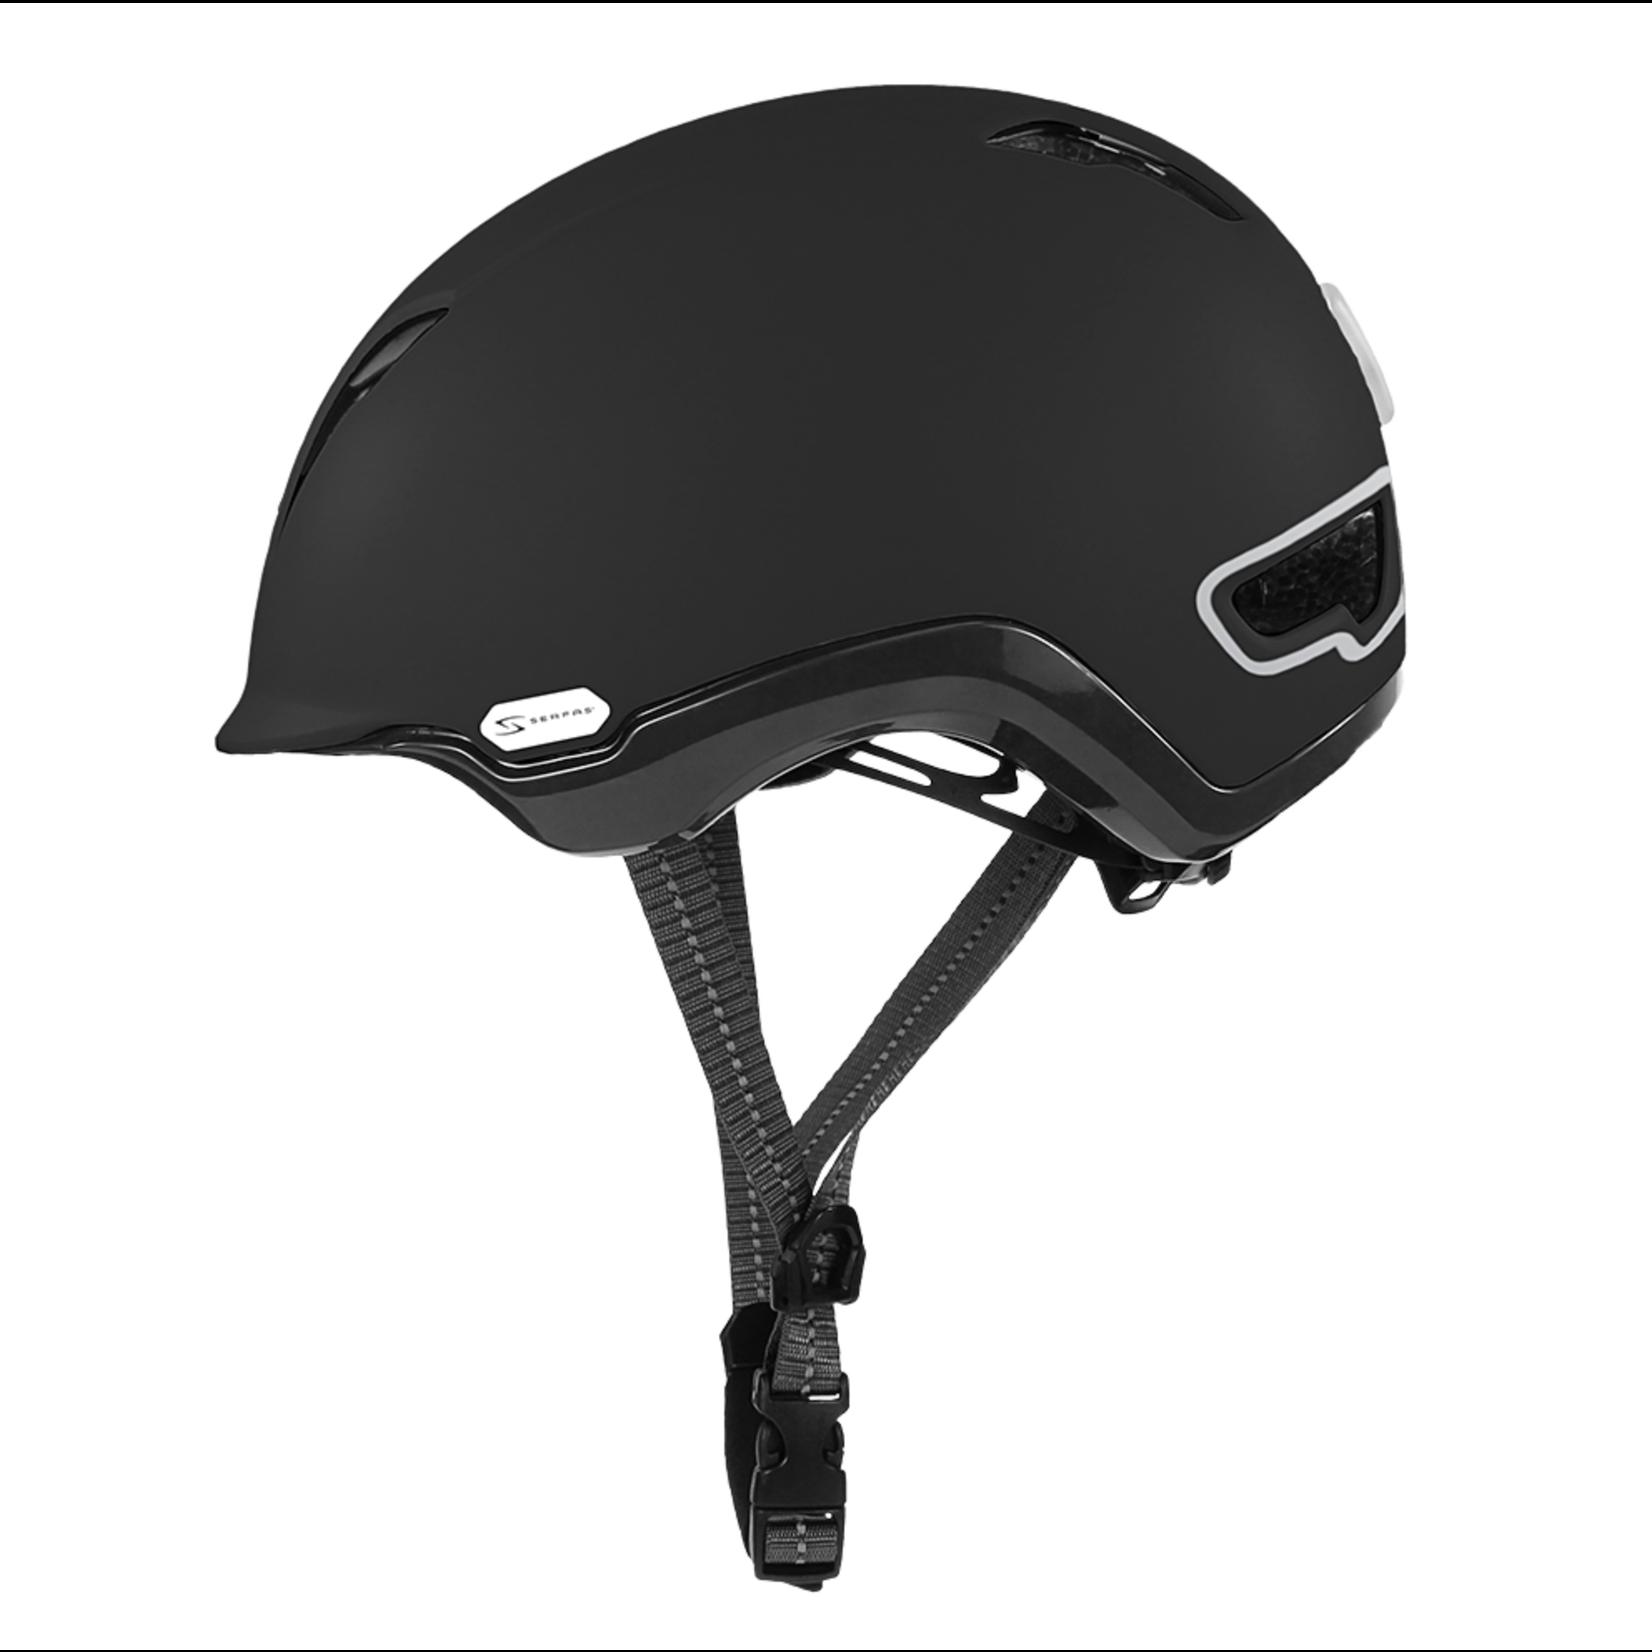 SERFAS Helmet HT-500MTBK KILOWATT E-BIKE MATTE BLACK S/M (SERFAS)